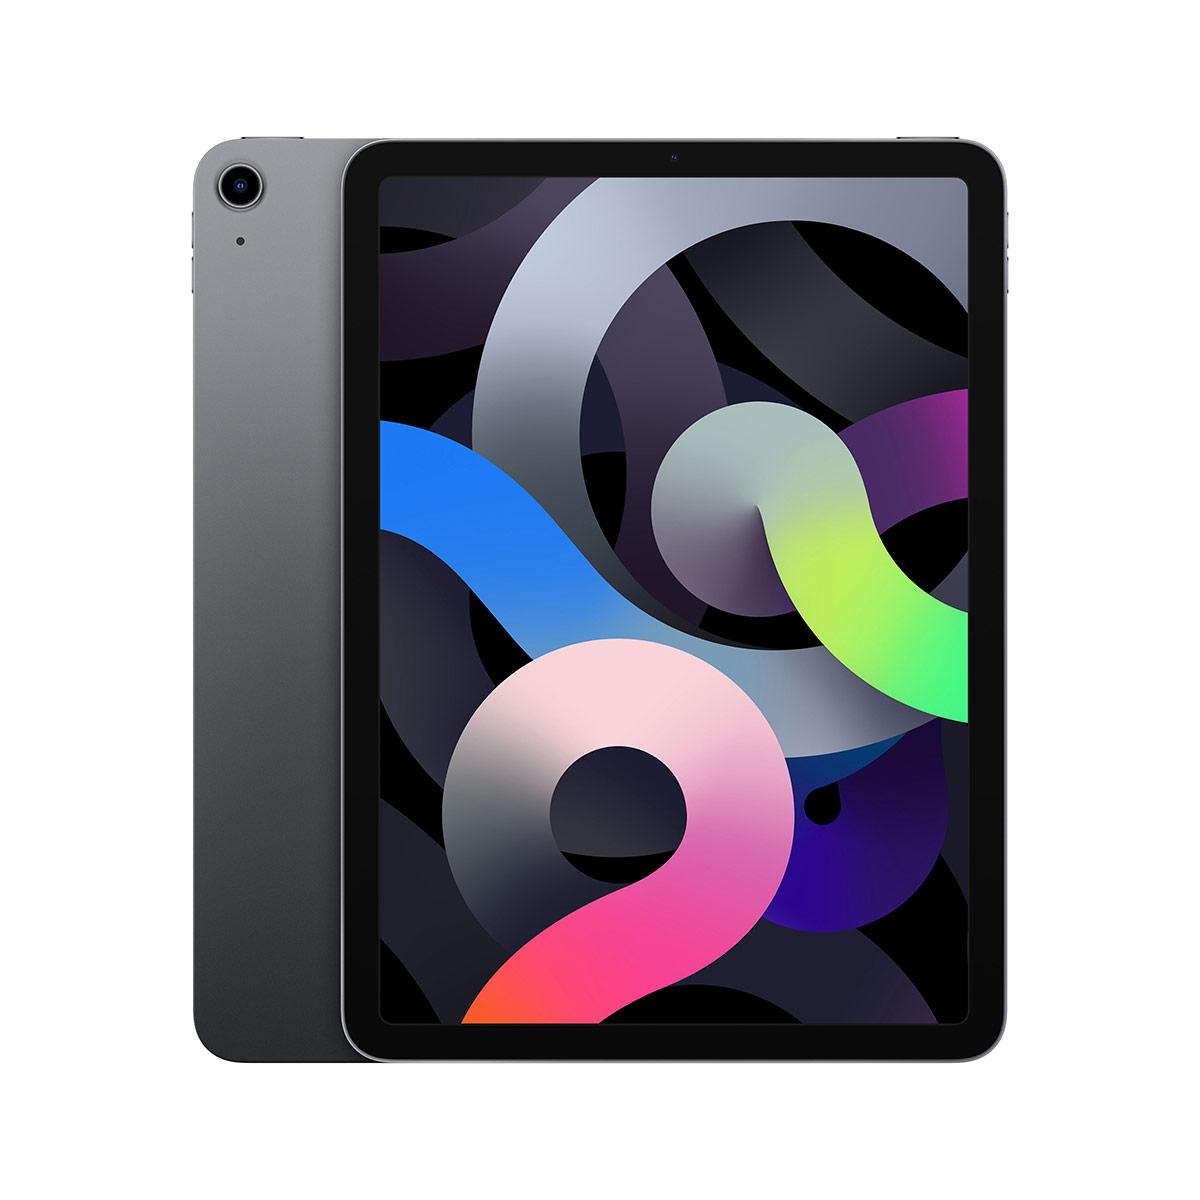 "Education Apple iPad Air 10.9"" 256GB WiFi - Space Grey"